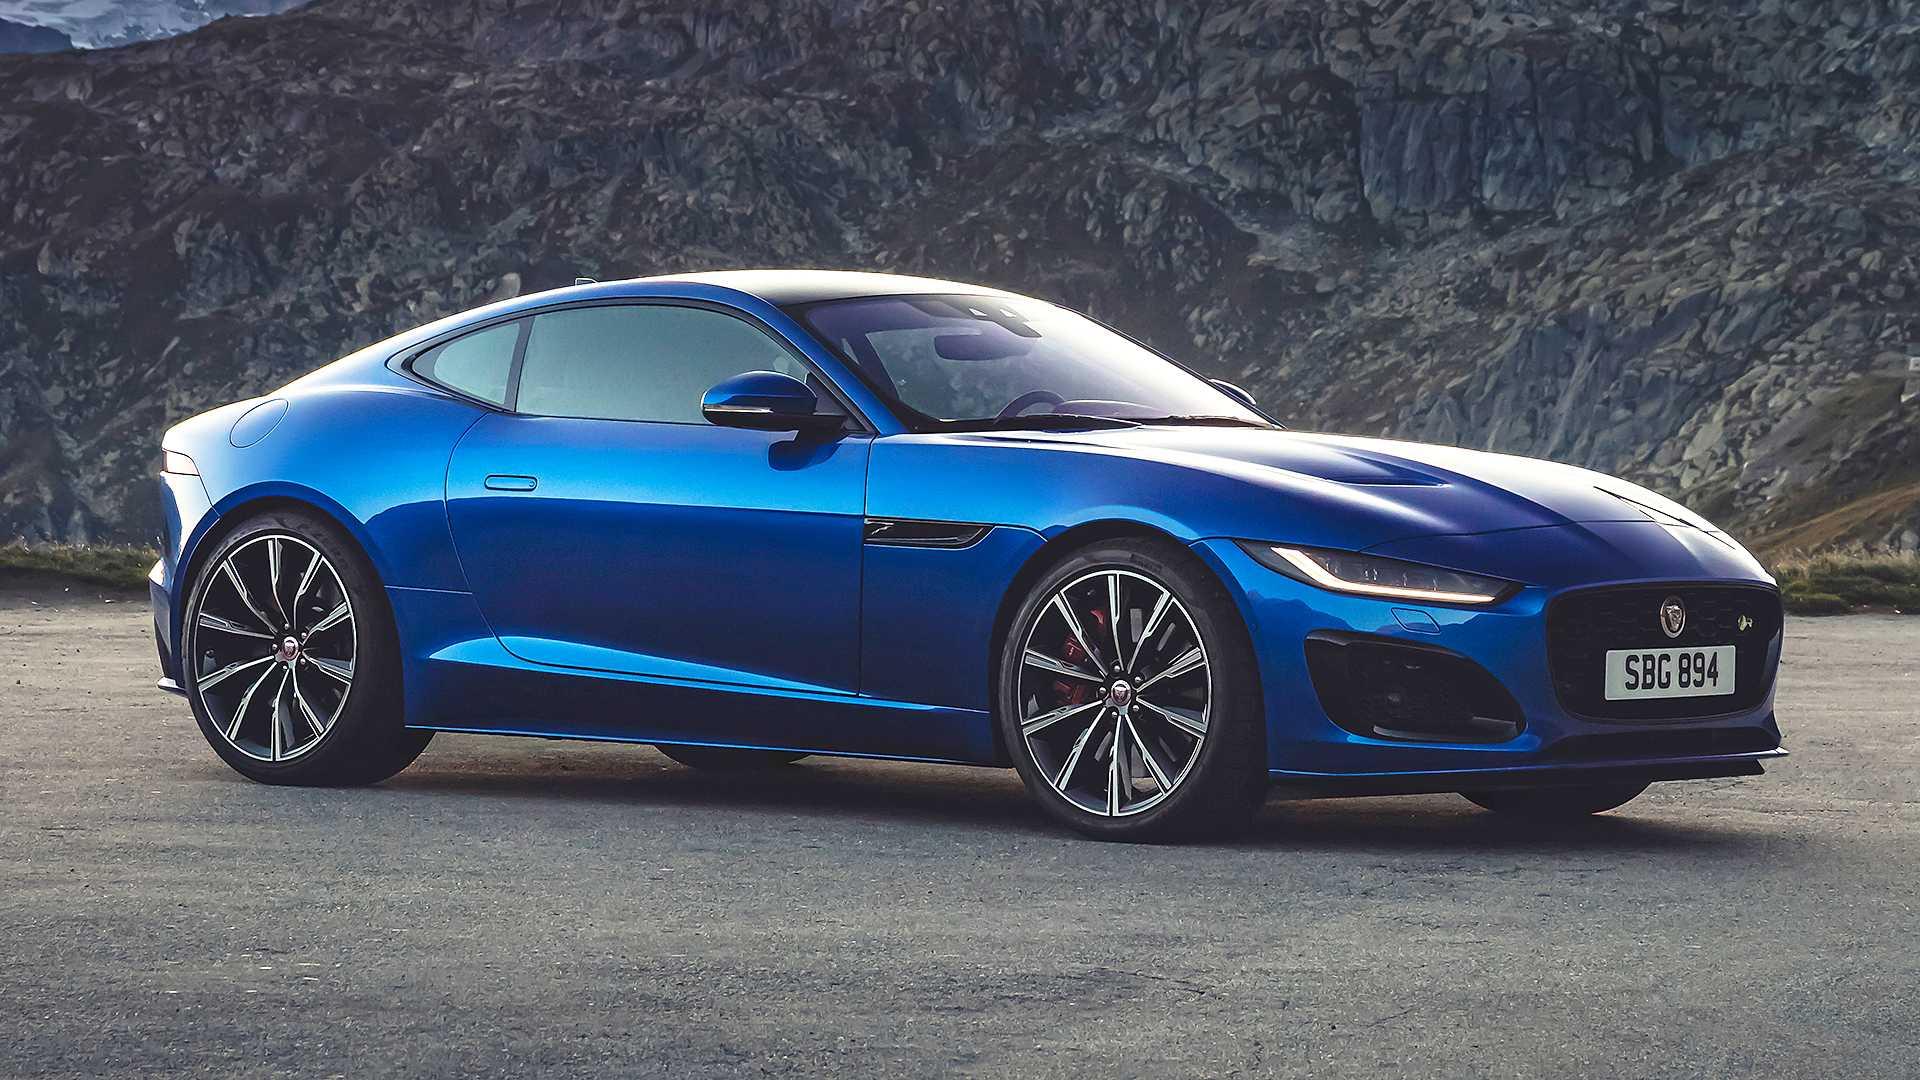 2021-jaguar-f-type-10